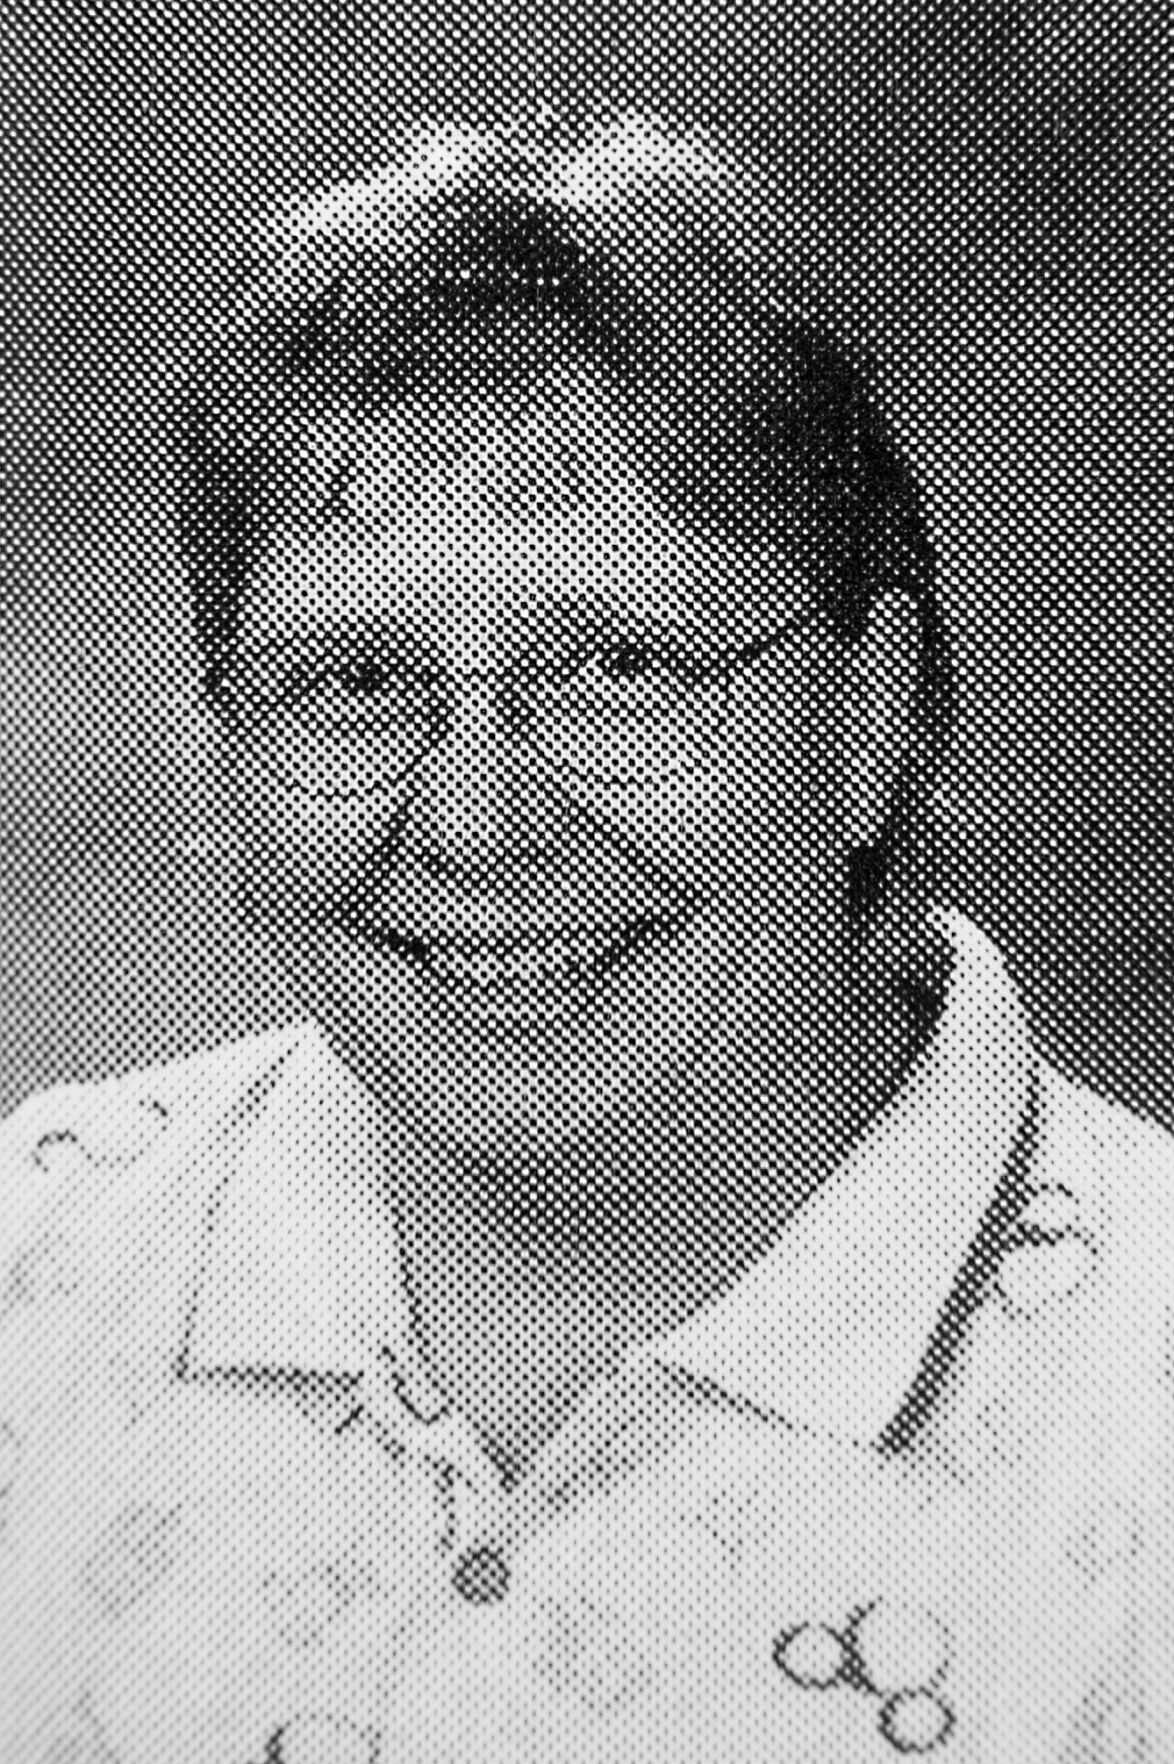 Tammy Grubb